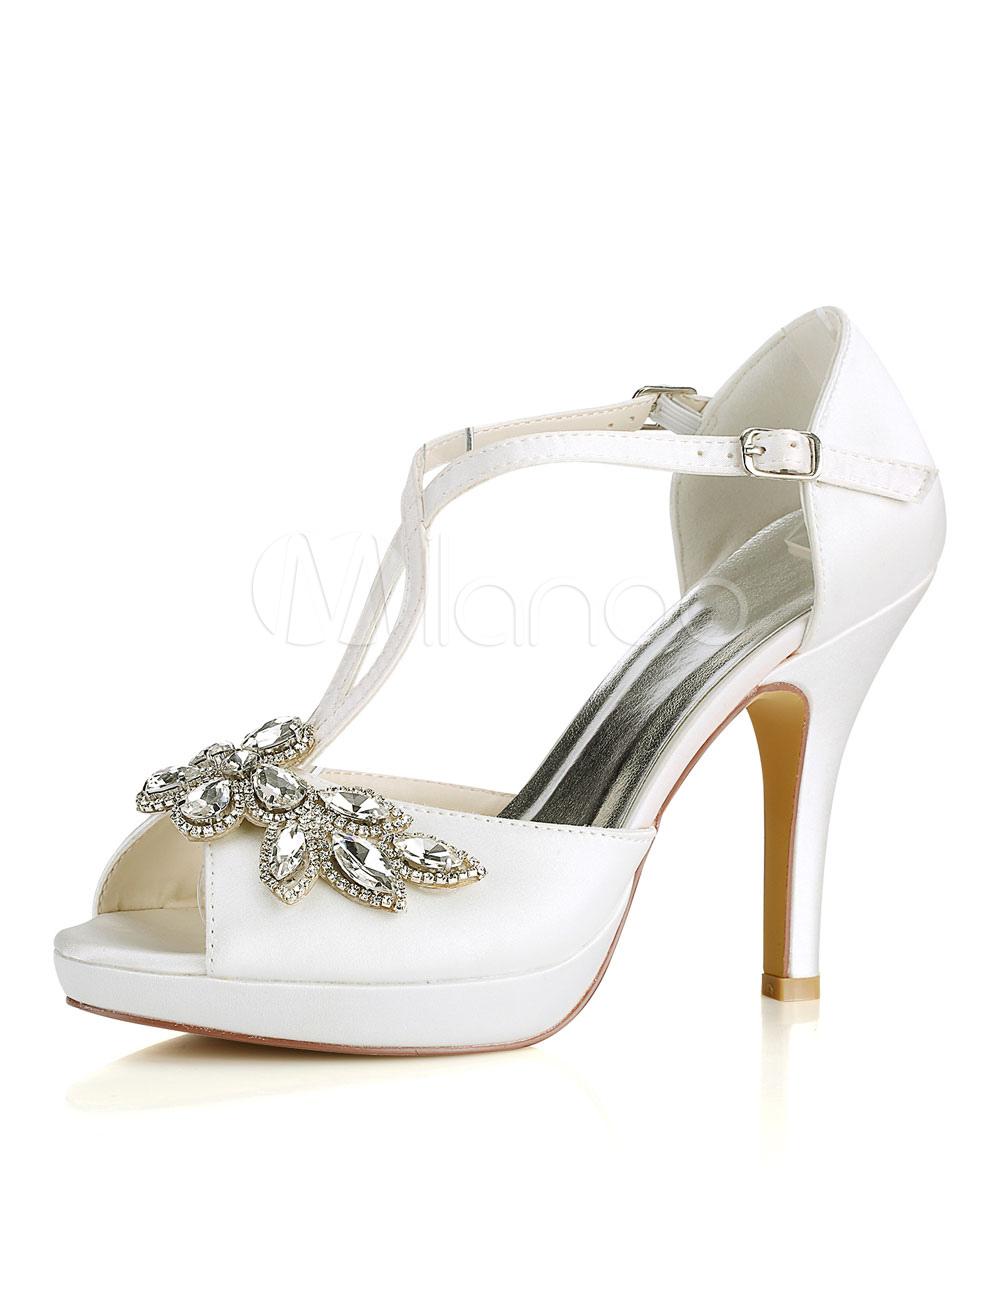 Zapatos de punter Peep Toe de tacón de stiletto de seda sintética con pedreríade lujo Fiesta de bodas IORej0